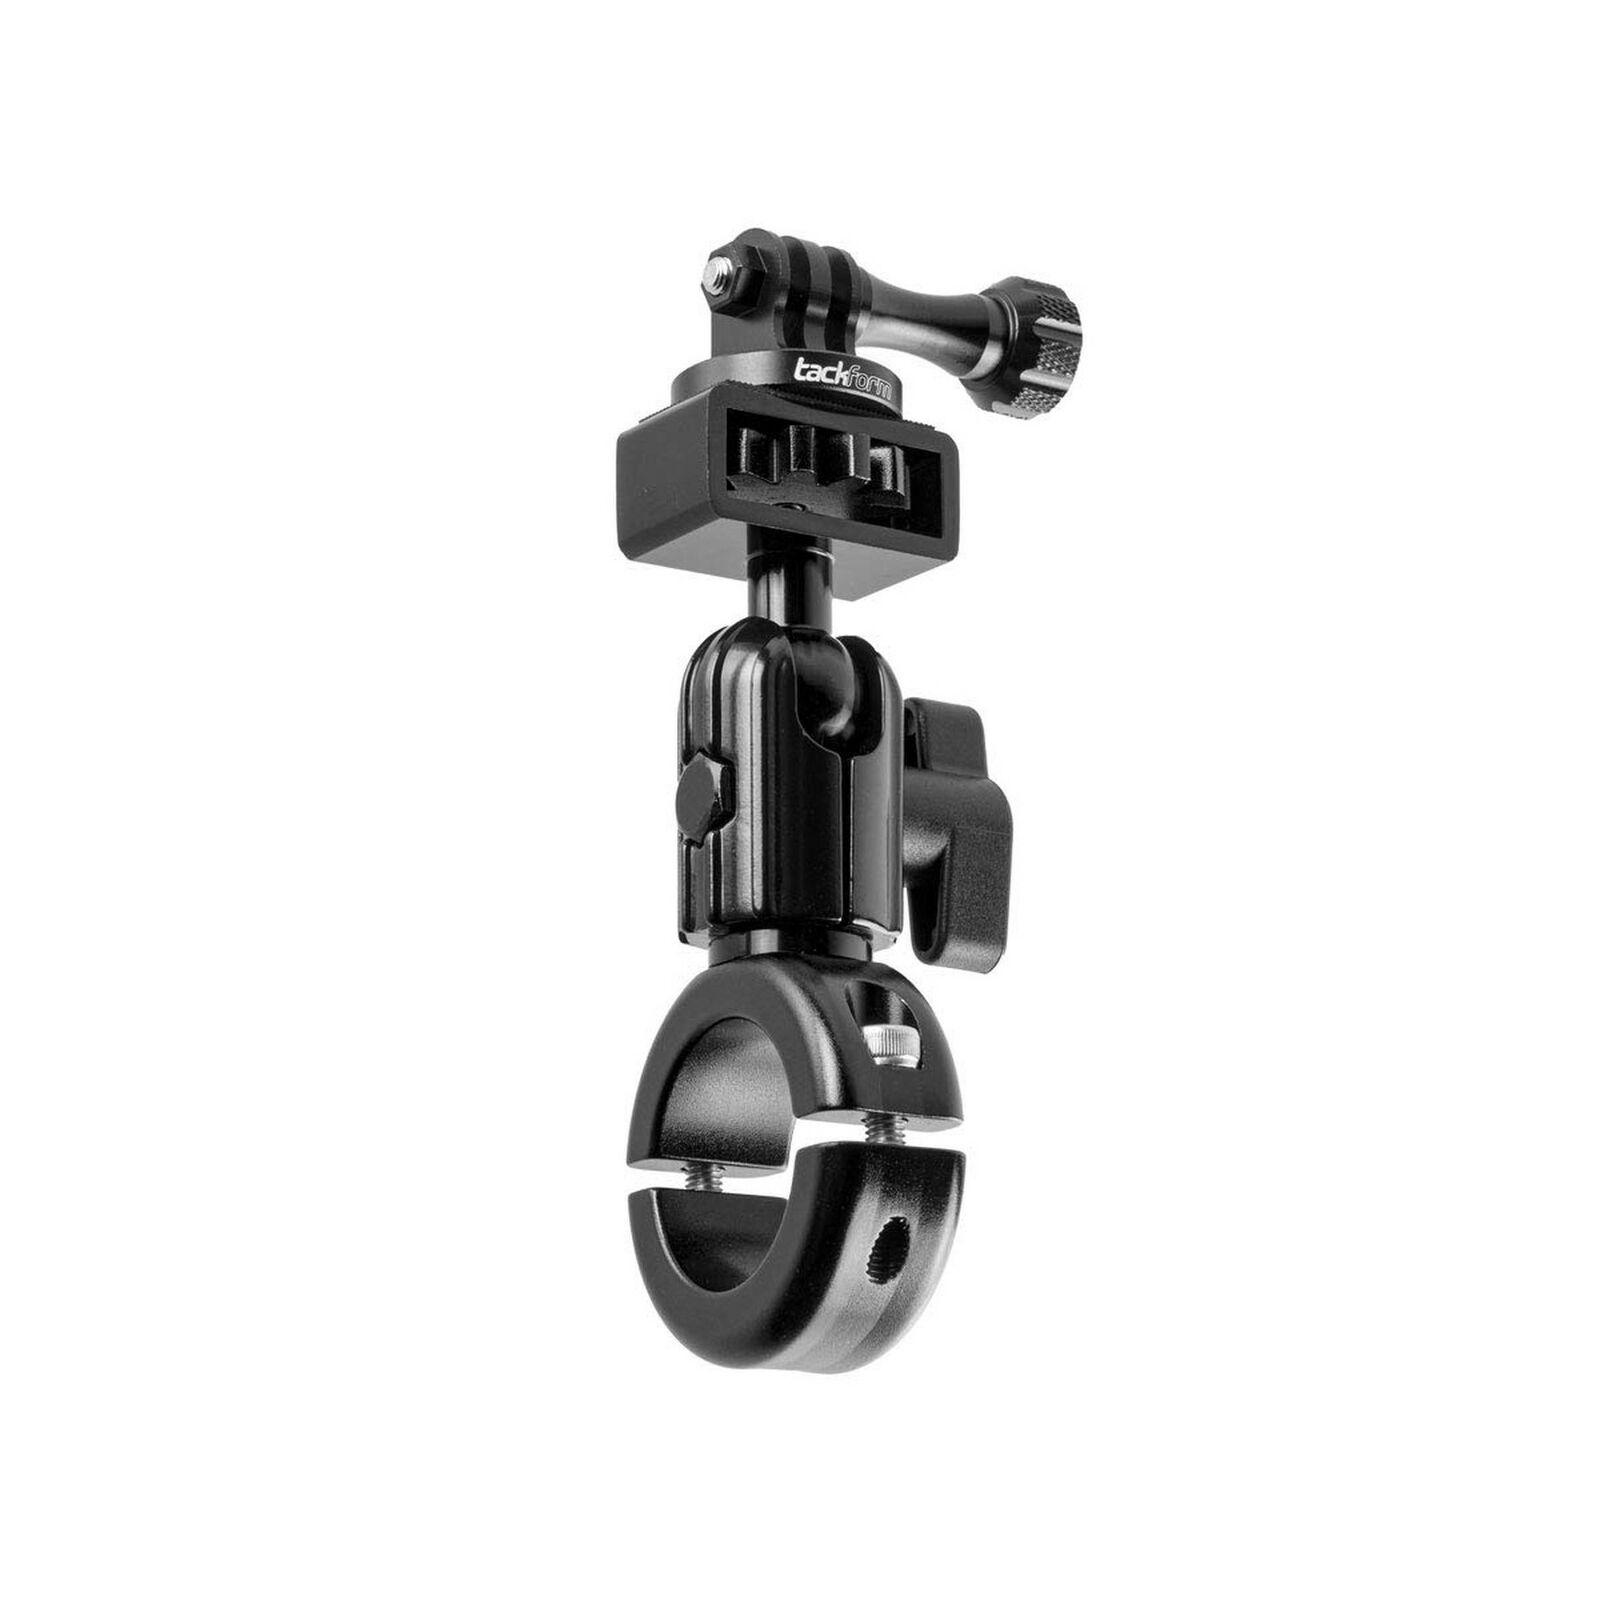 Tackform Motorcycle Action Camera Mount - [Enduro Series] Bar Mount and Trail...